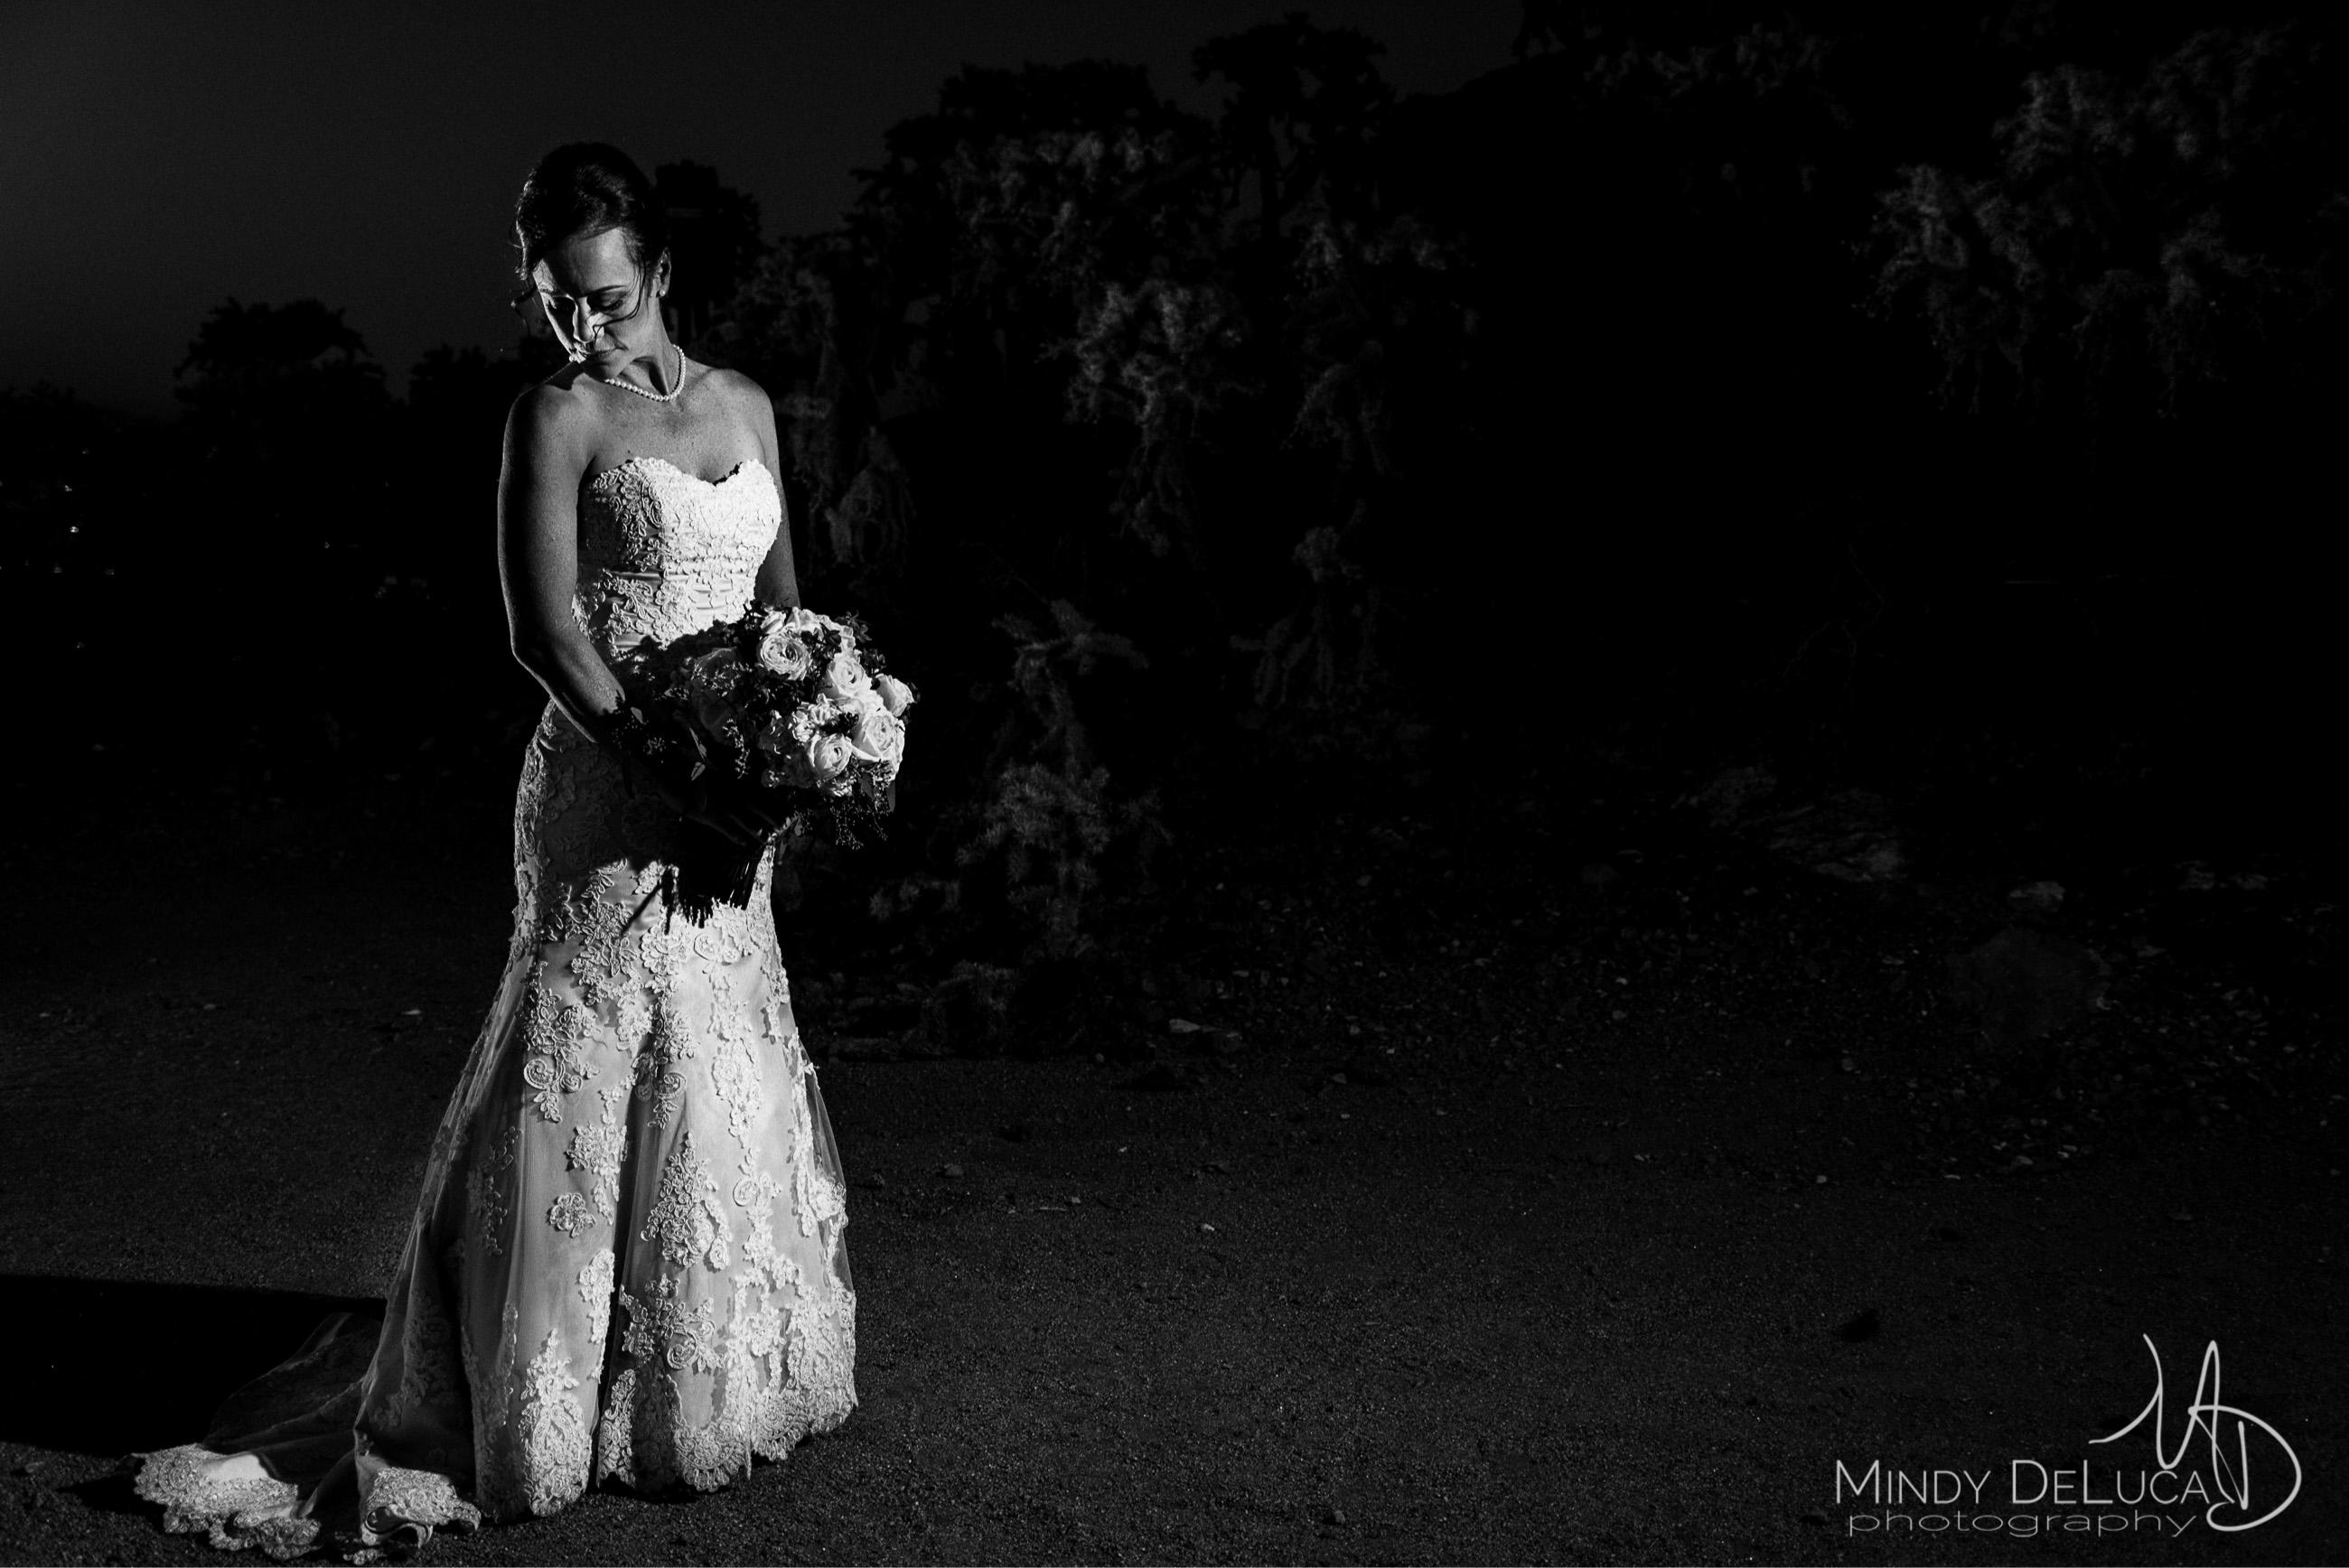 Black & white nighttime bridal photo